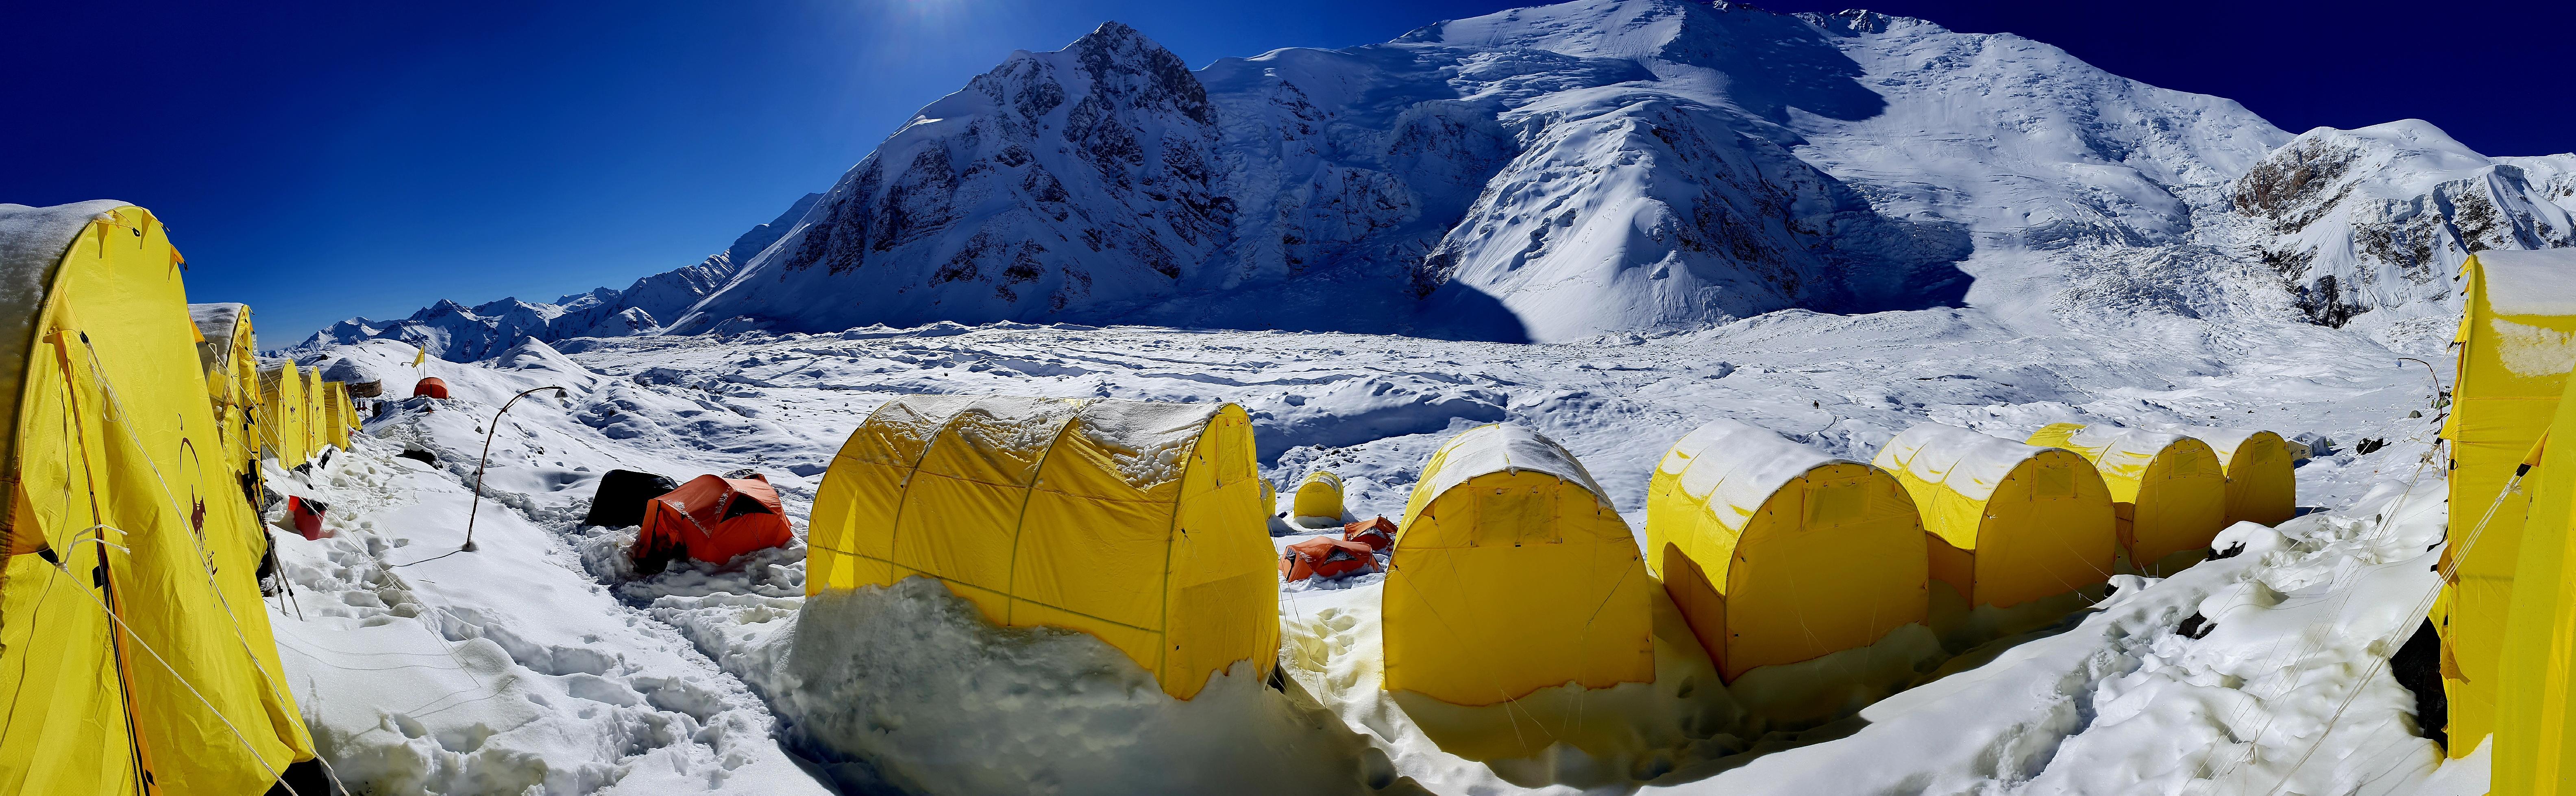 Peak Lenin - camp 1 (Kyrgyzstan)